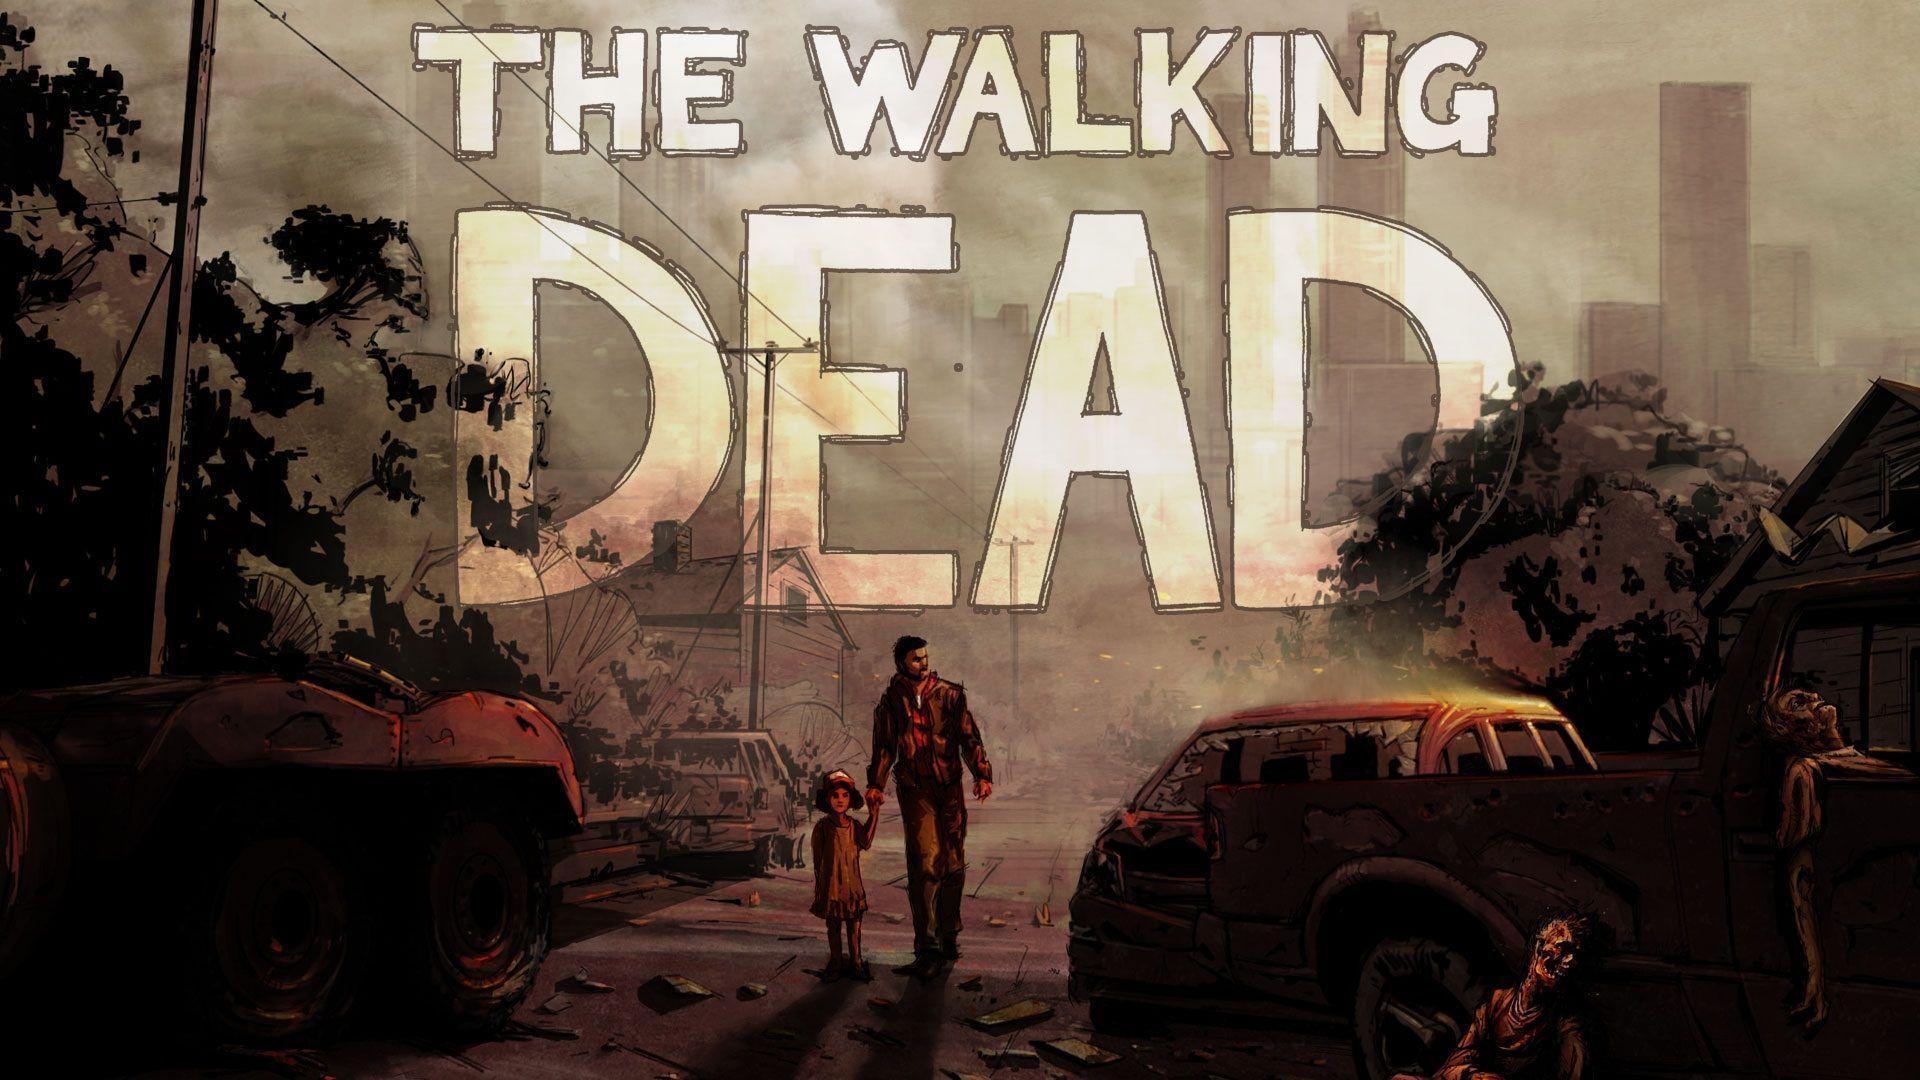 The Walking Dead on MaleReader-Inserts - DeviantArt